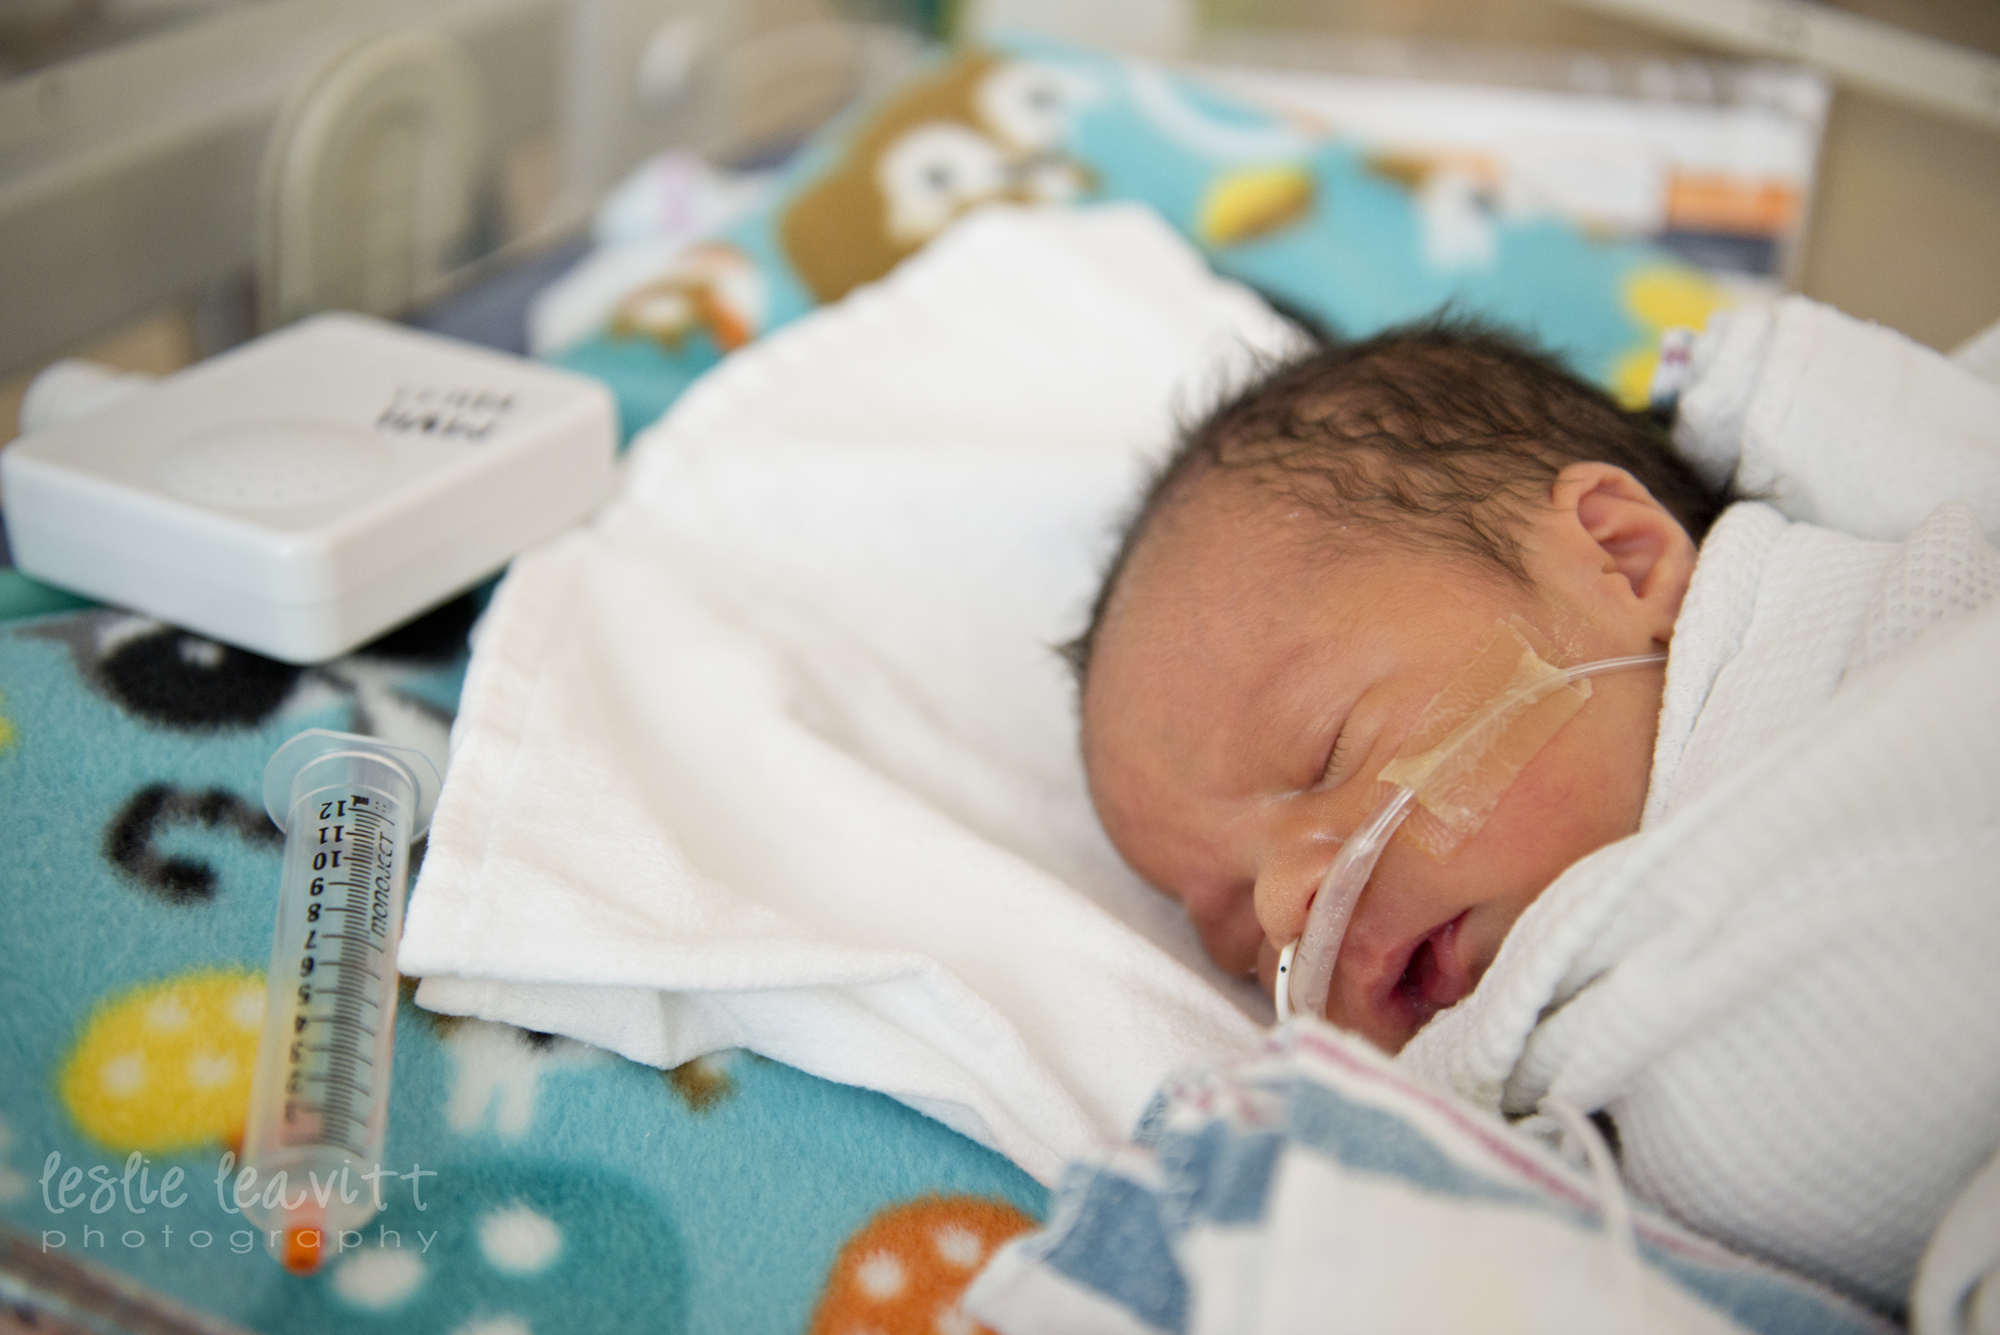 hospital baby photo 03.jpg